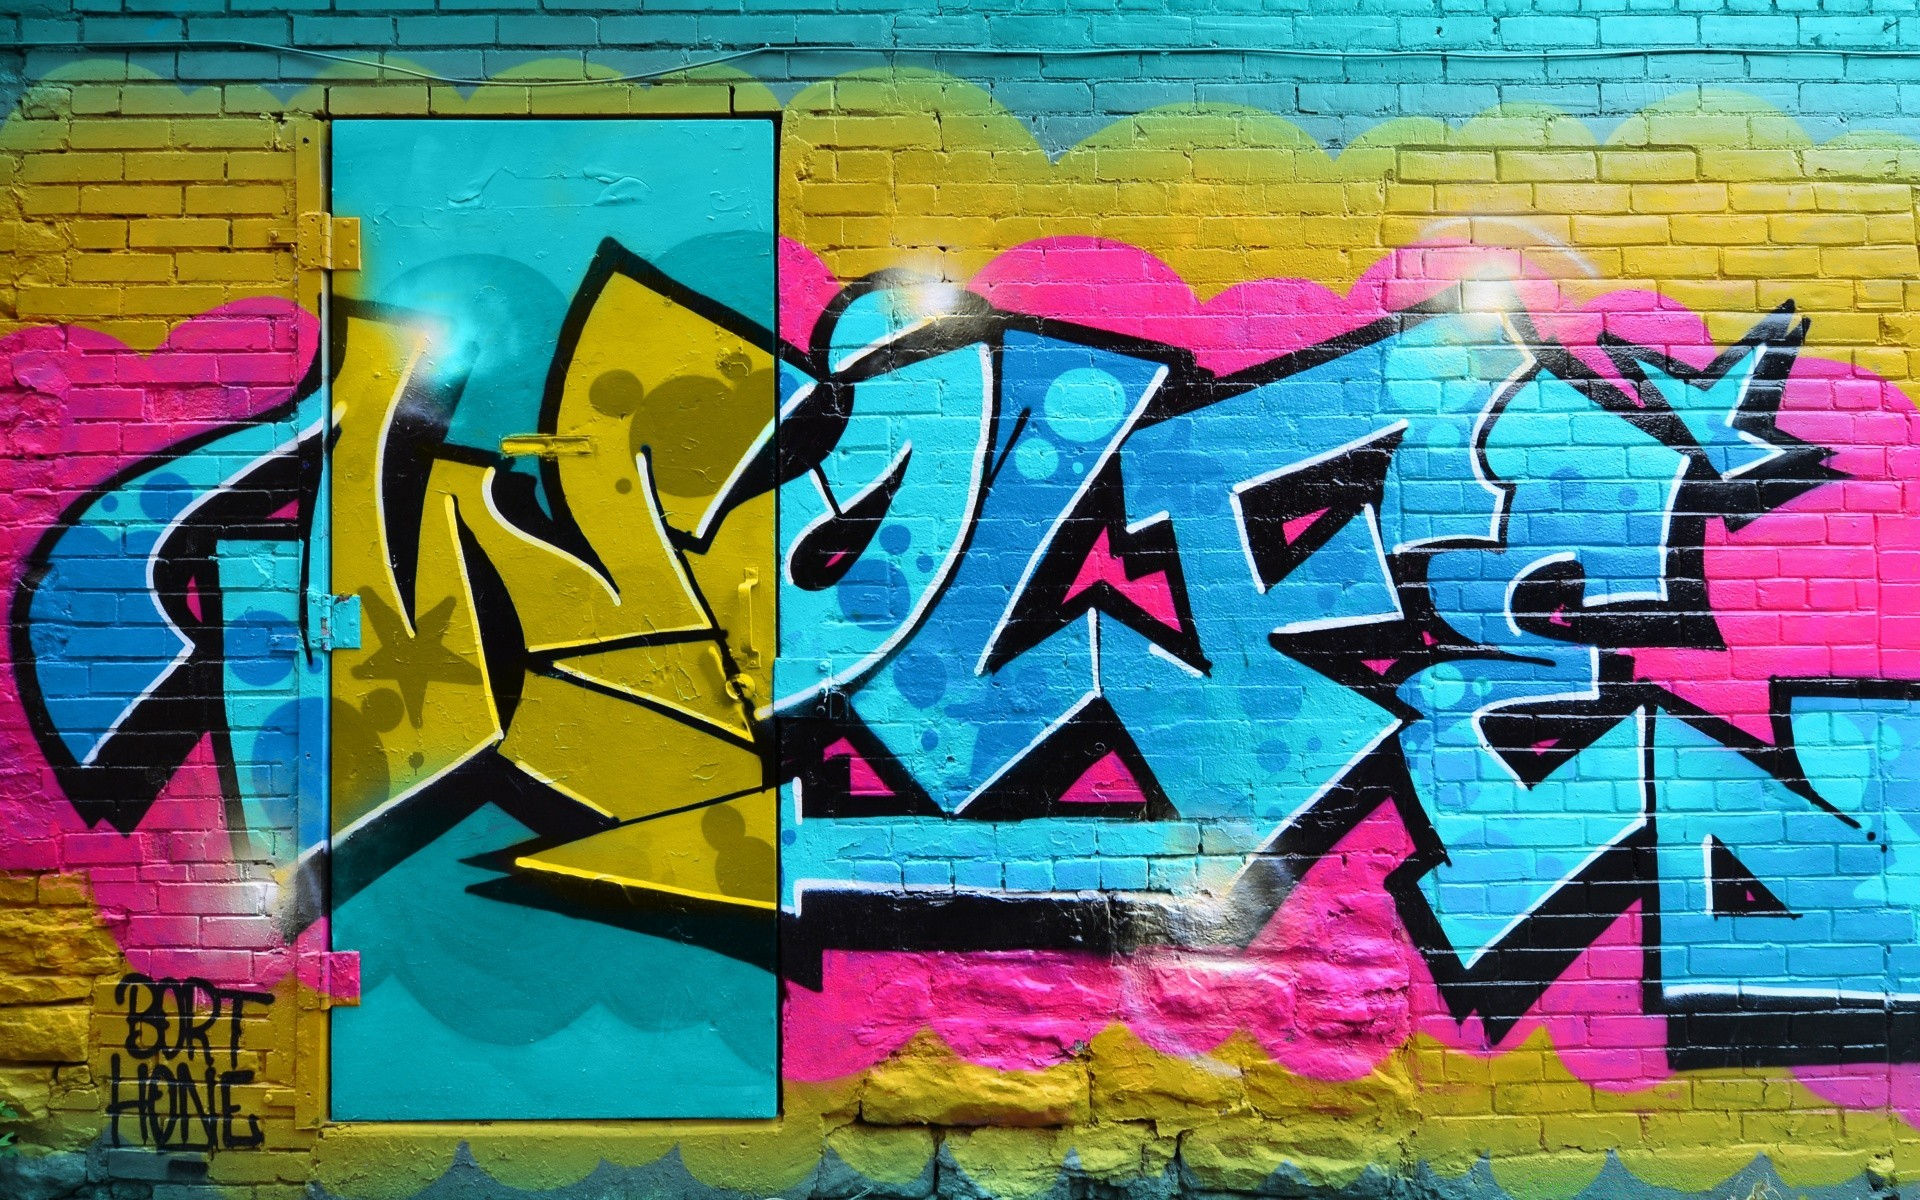 Хип хоп обои на стену